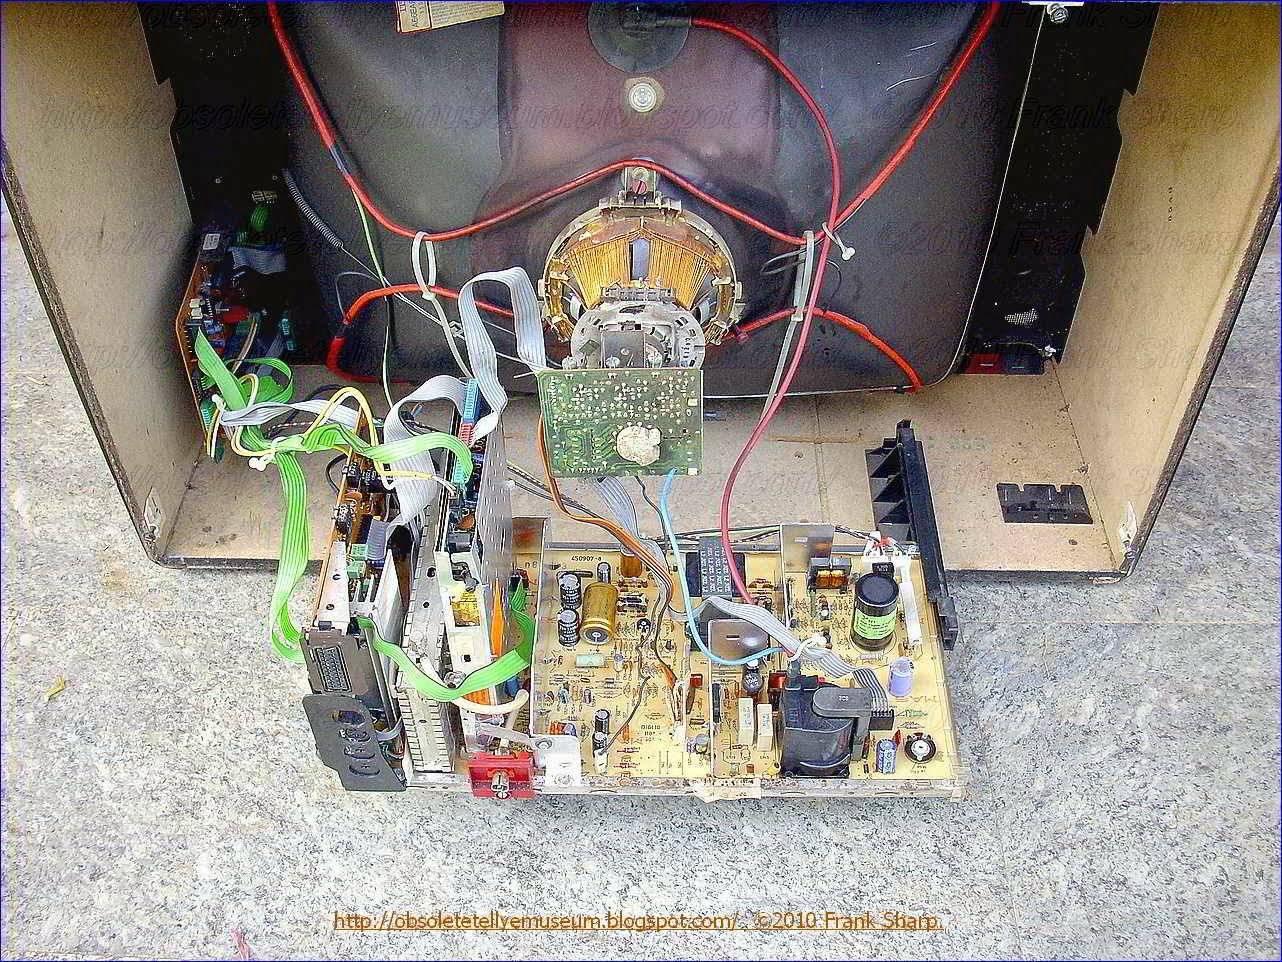 Obsolete Technology Tellye !: ITT DIGIVISION 3876 HIFI OSCAR